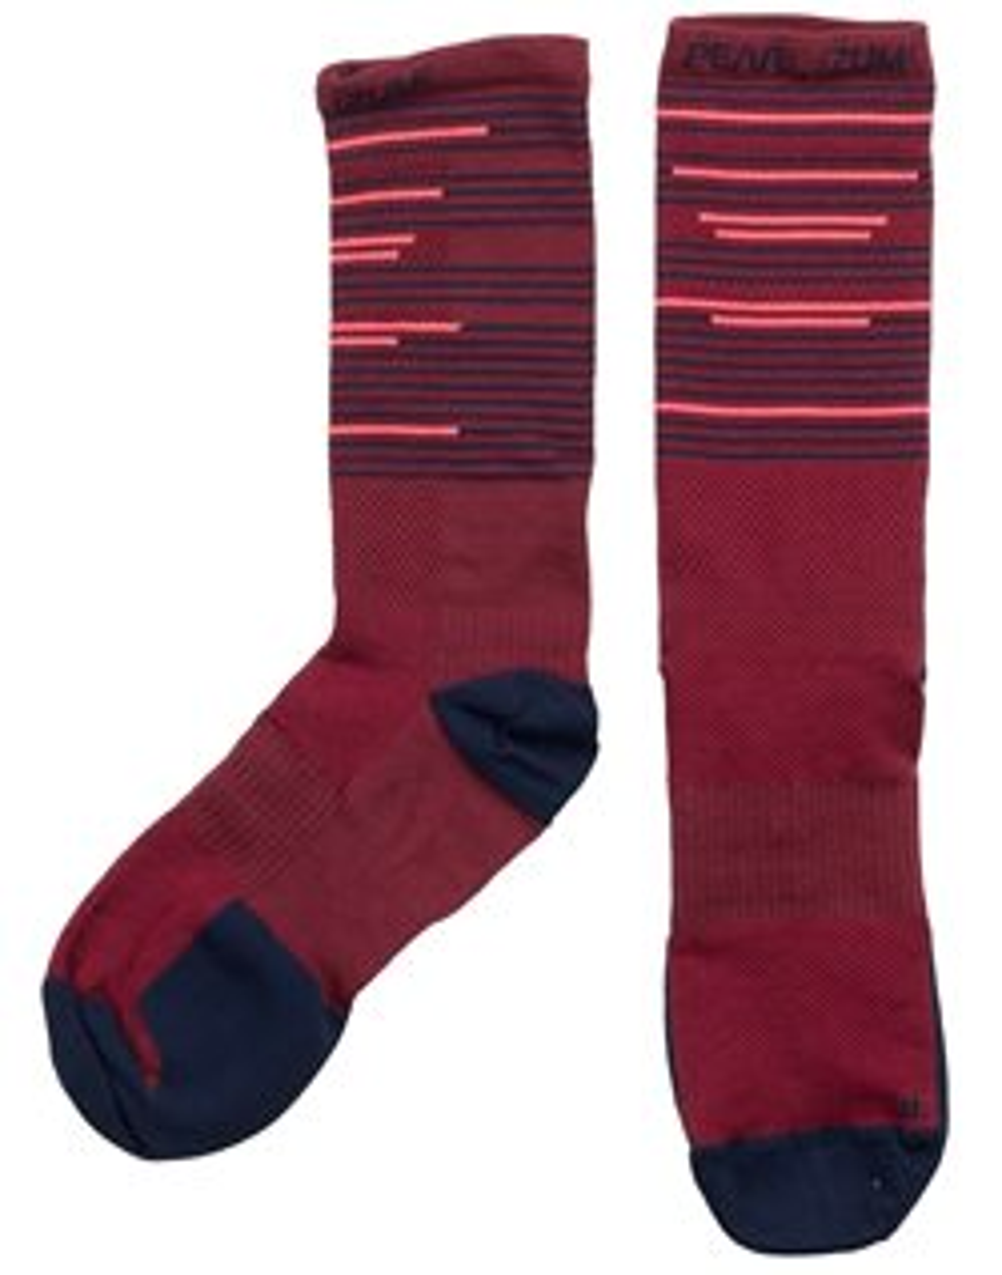 Pearl Izumi Elite Tall Socks Men's Size Medium in Port/Midnight Navy Tidal